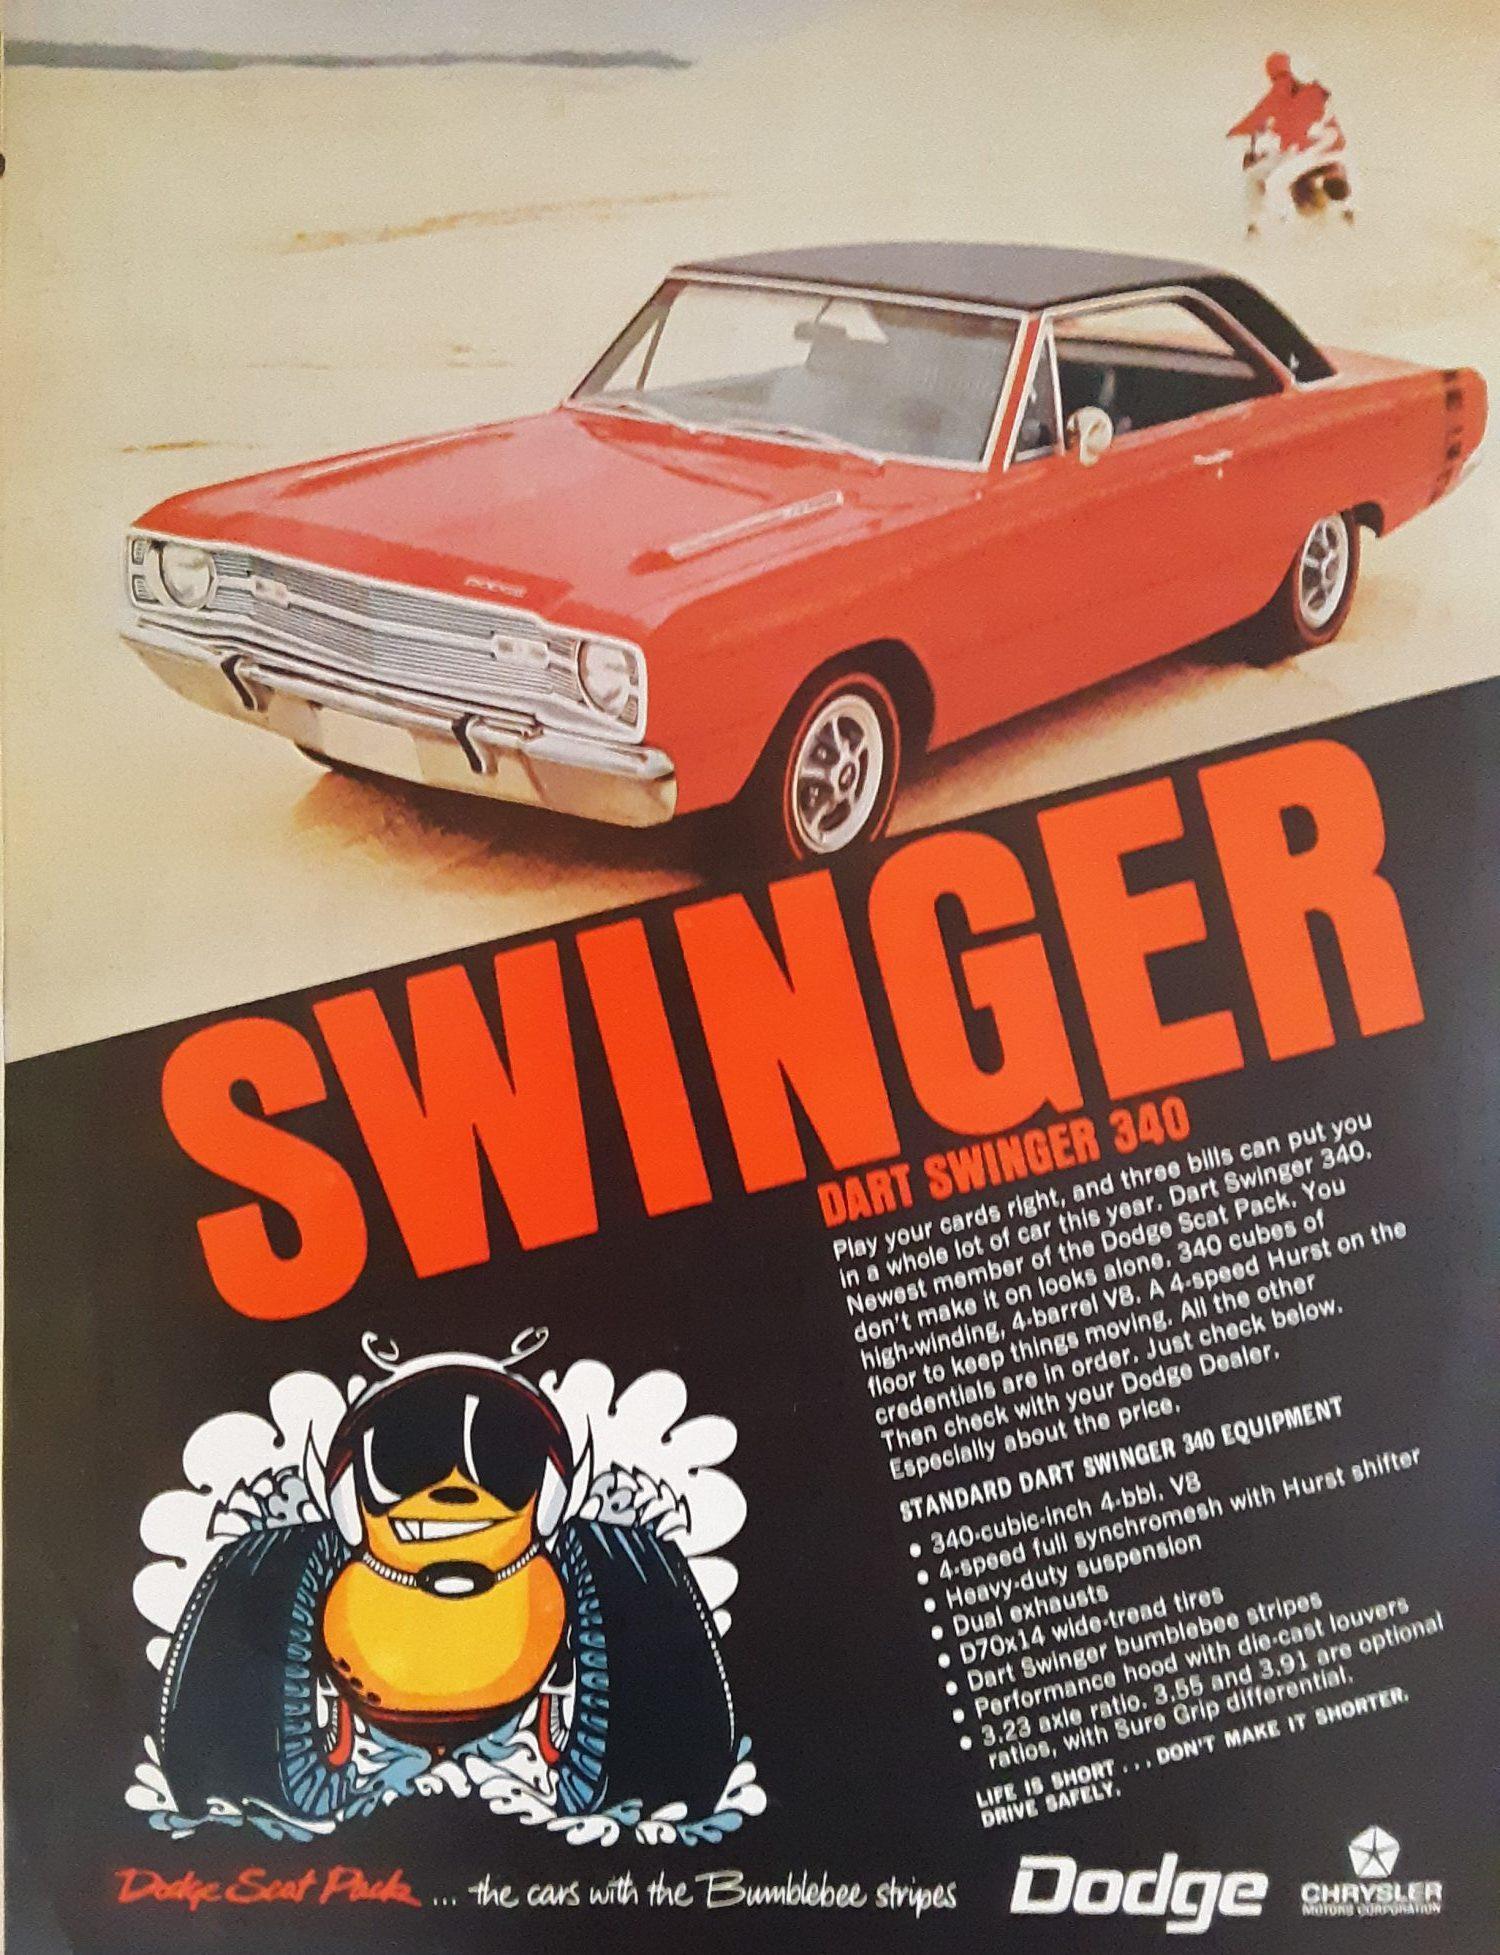 Old Dodge Dart Swinger advertisement